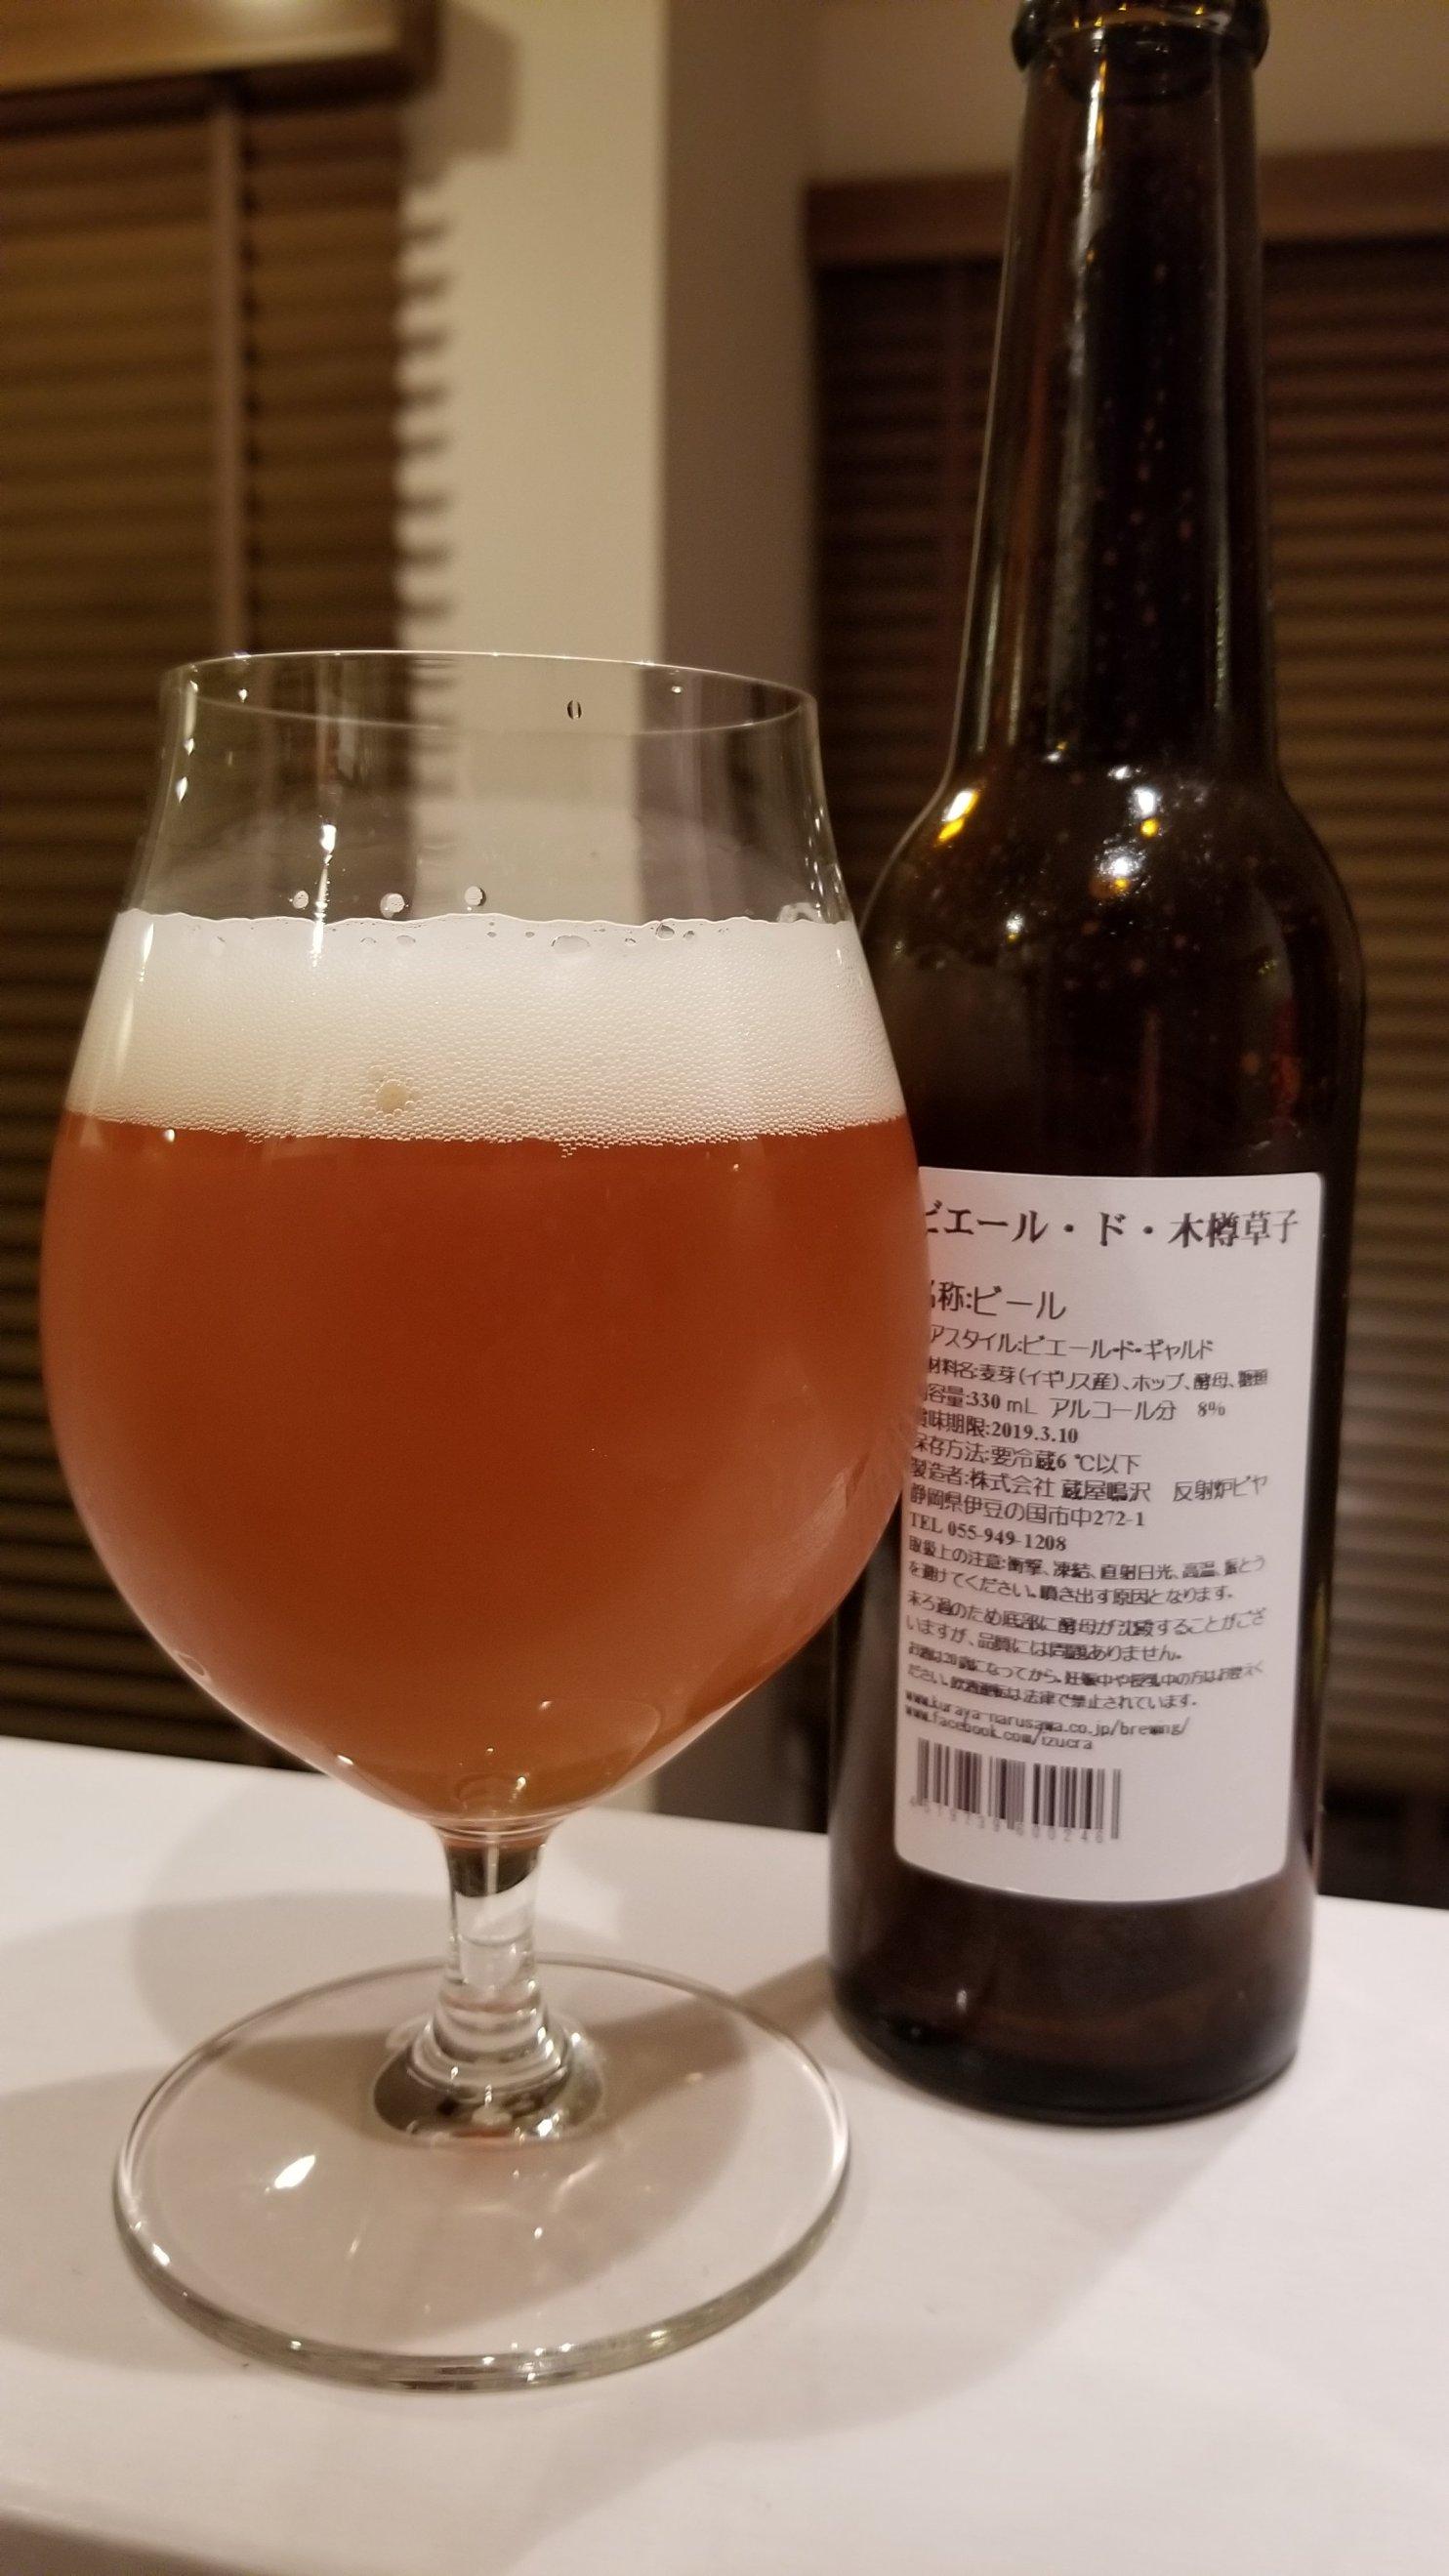 Hansharo Biere De Kidaru Soushi 反射炉ビエールド木樽草子 2